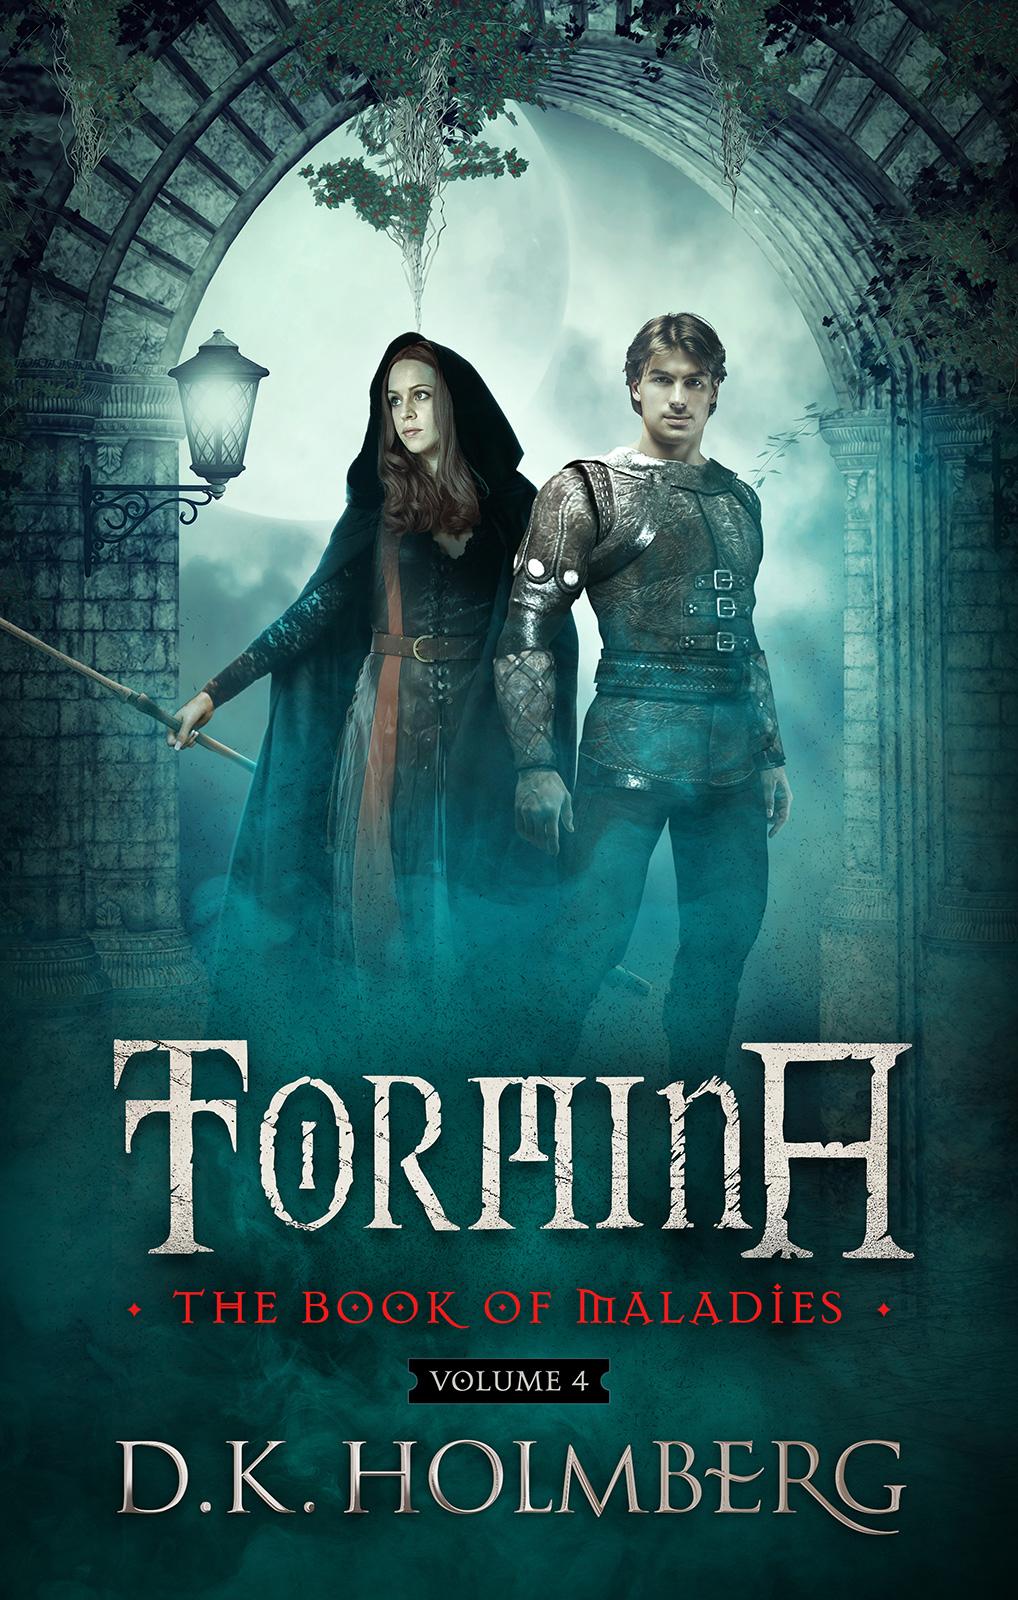 Tormina by DK Holmberg